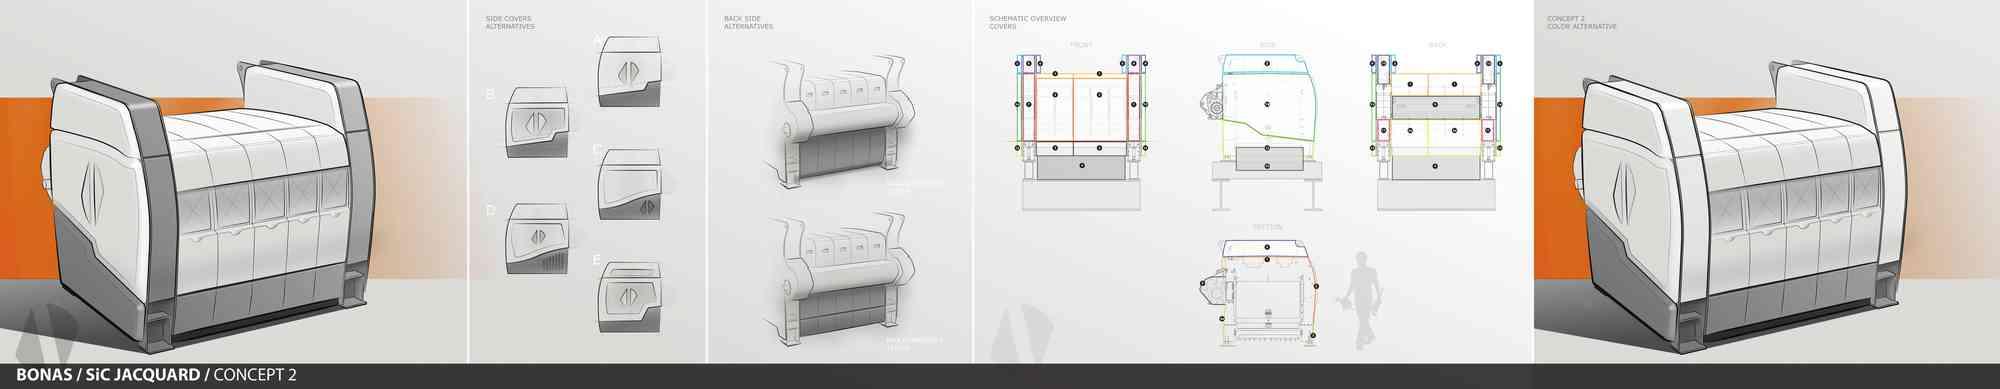 Capotage machine Jacquard pour tissage tapis